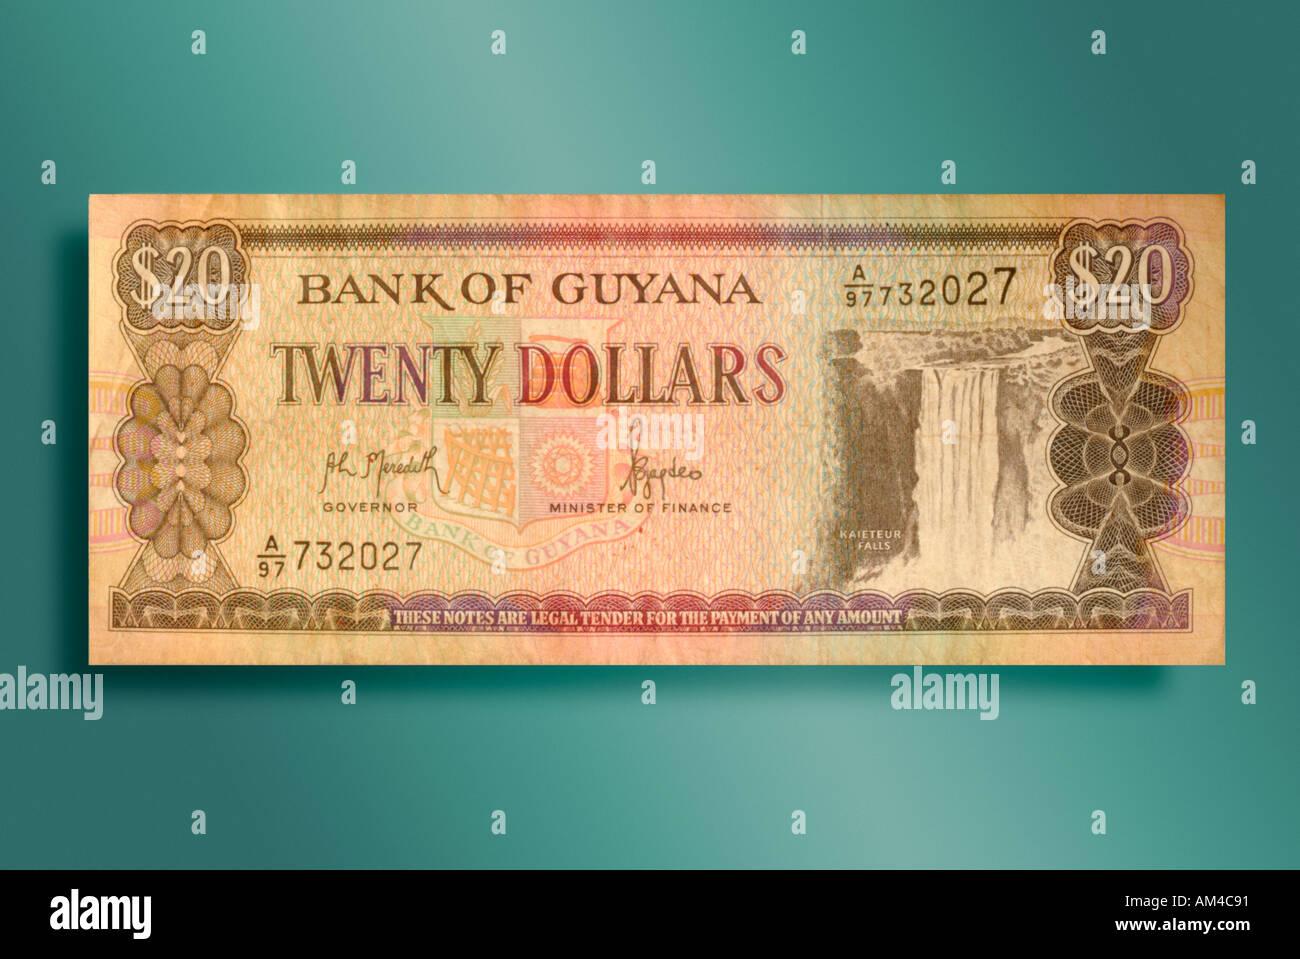 20 dollar bill from Guyana - Stock Image